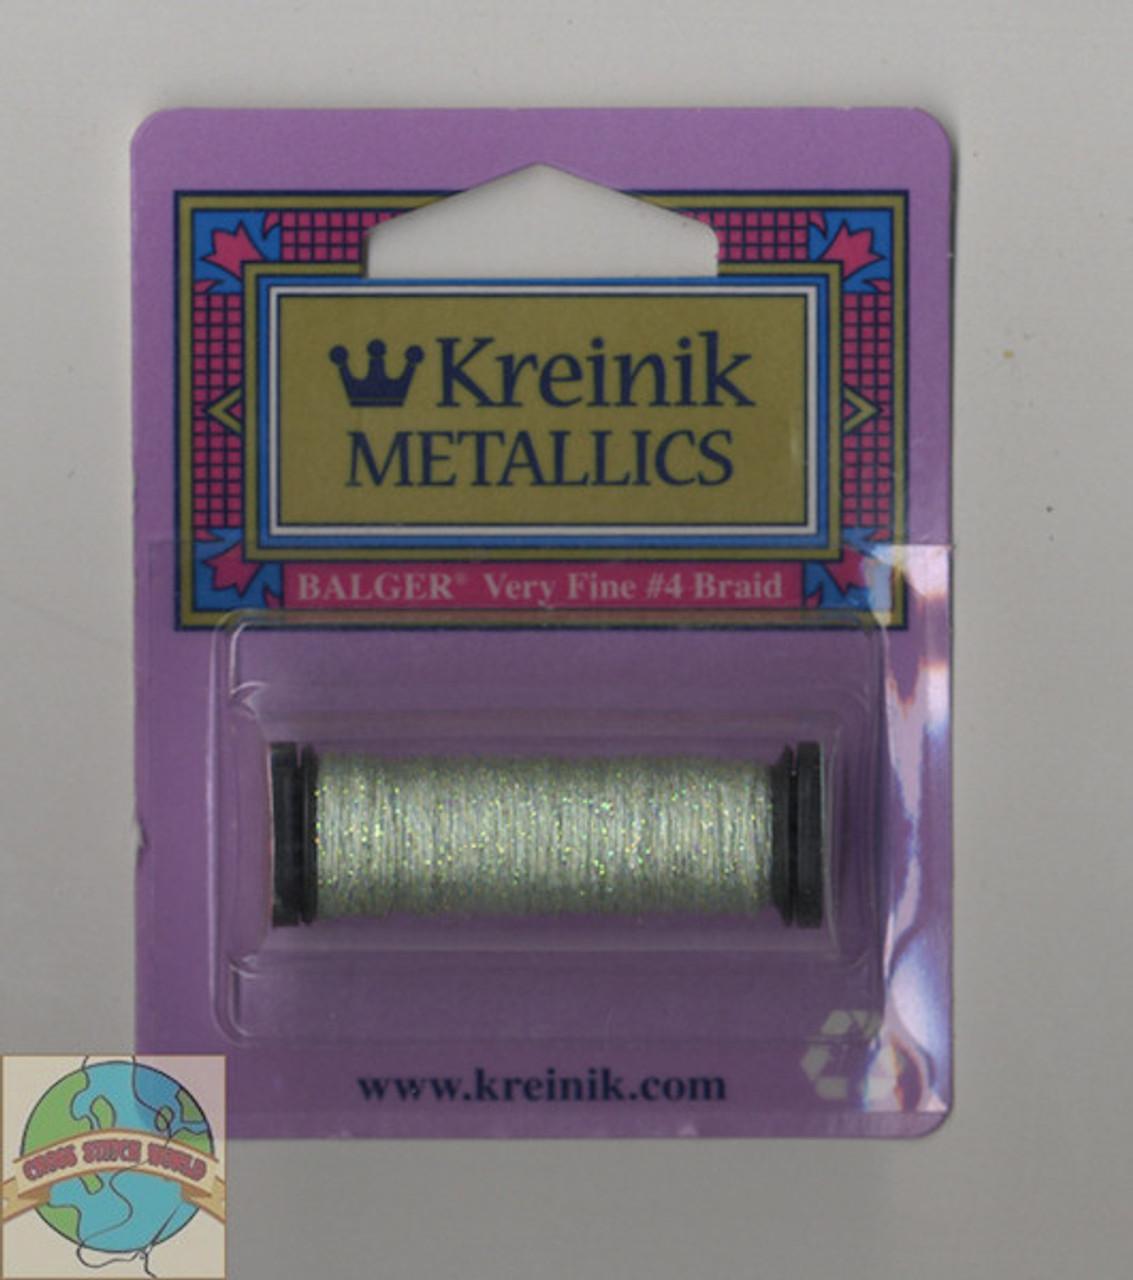 Kreinik Metallics - Very Fine #4 Pale Green #198